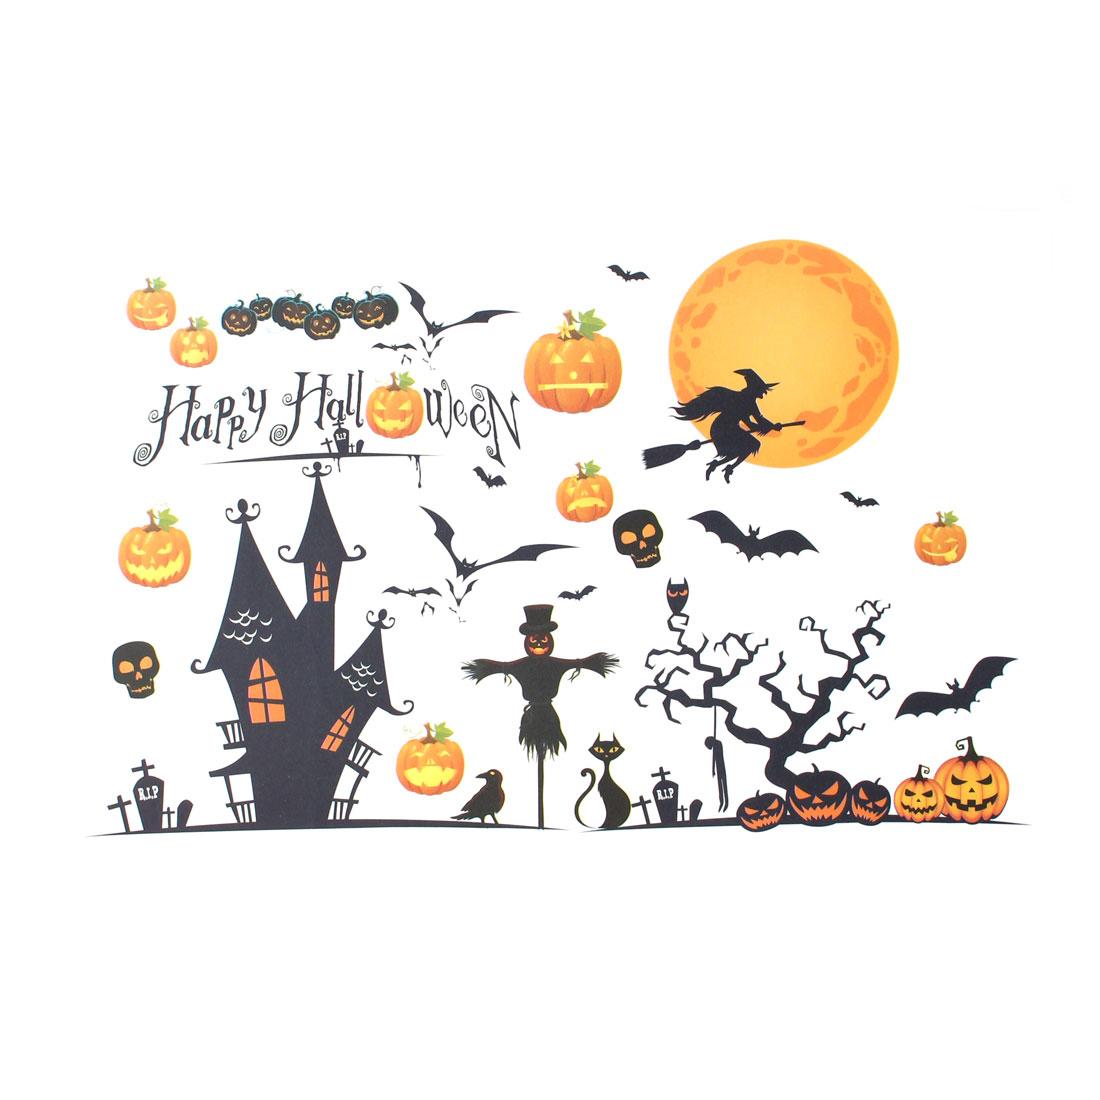 Holiday Festival Home Decoration Halloween Pumpkin Witch Bat Decorative Wall Sticker